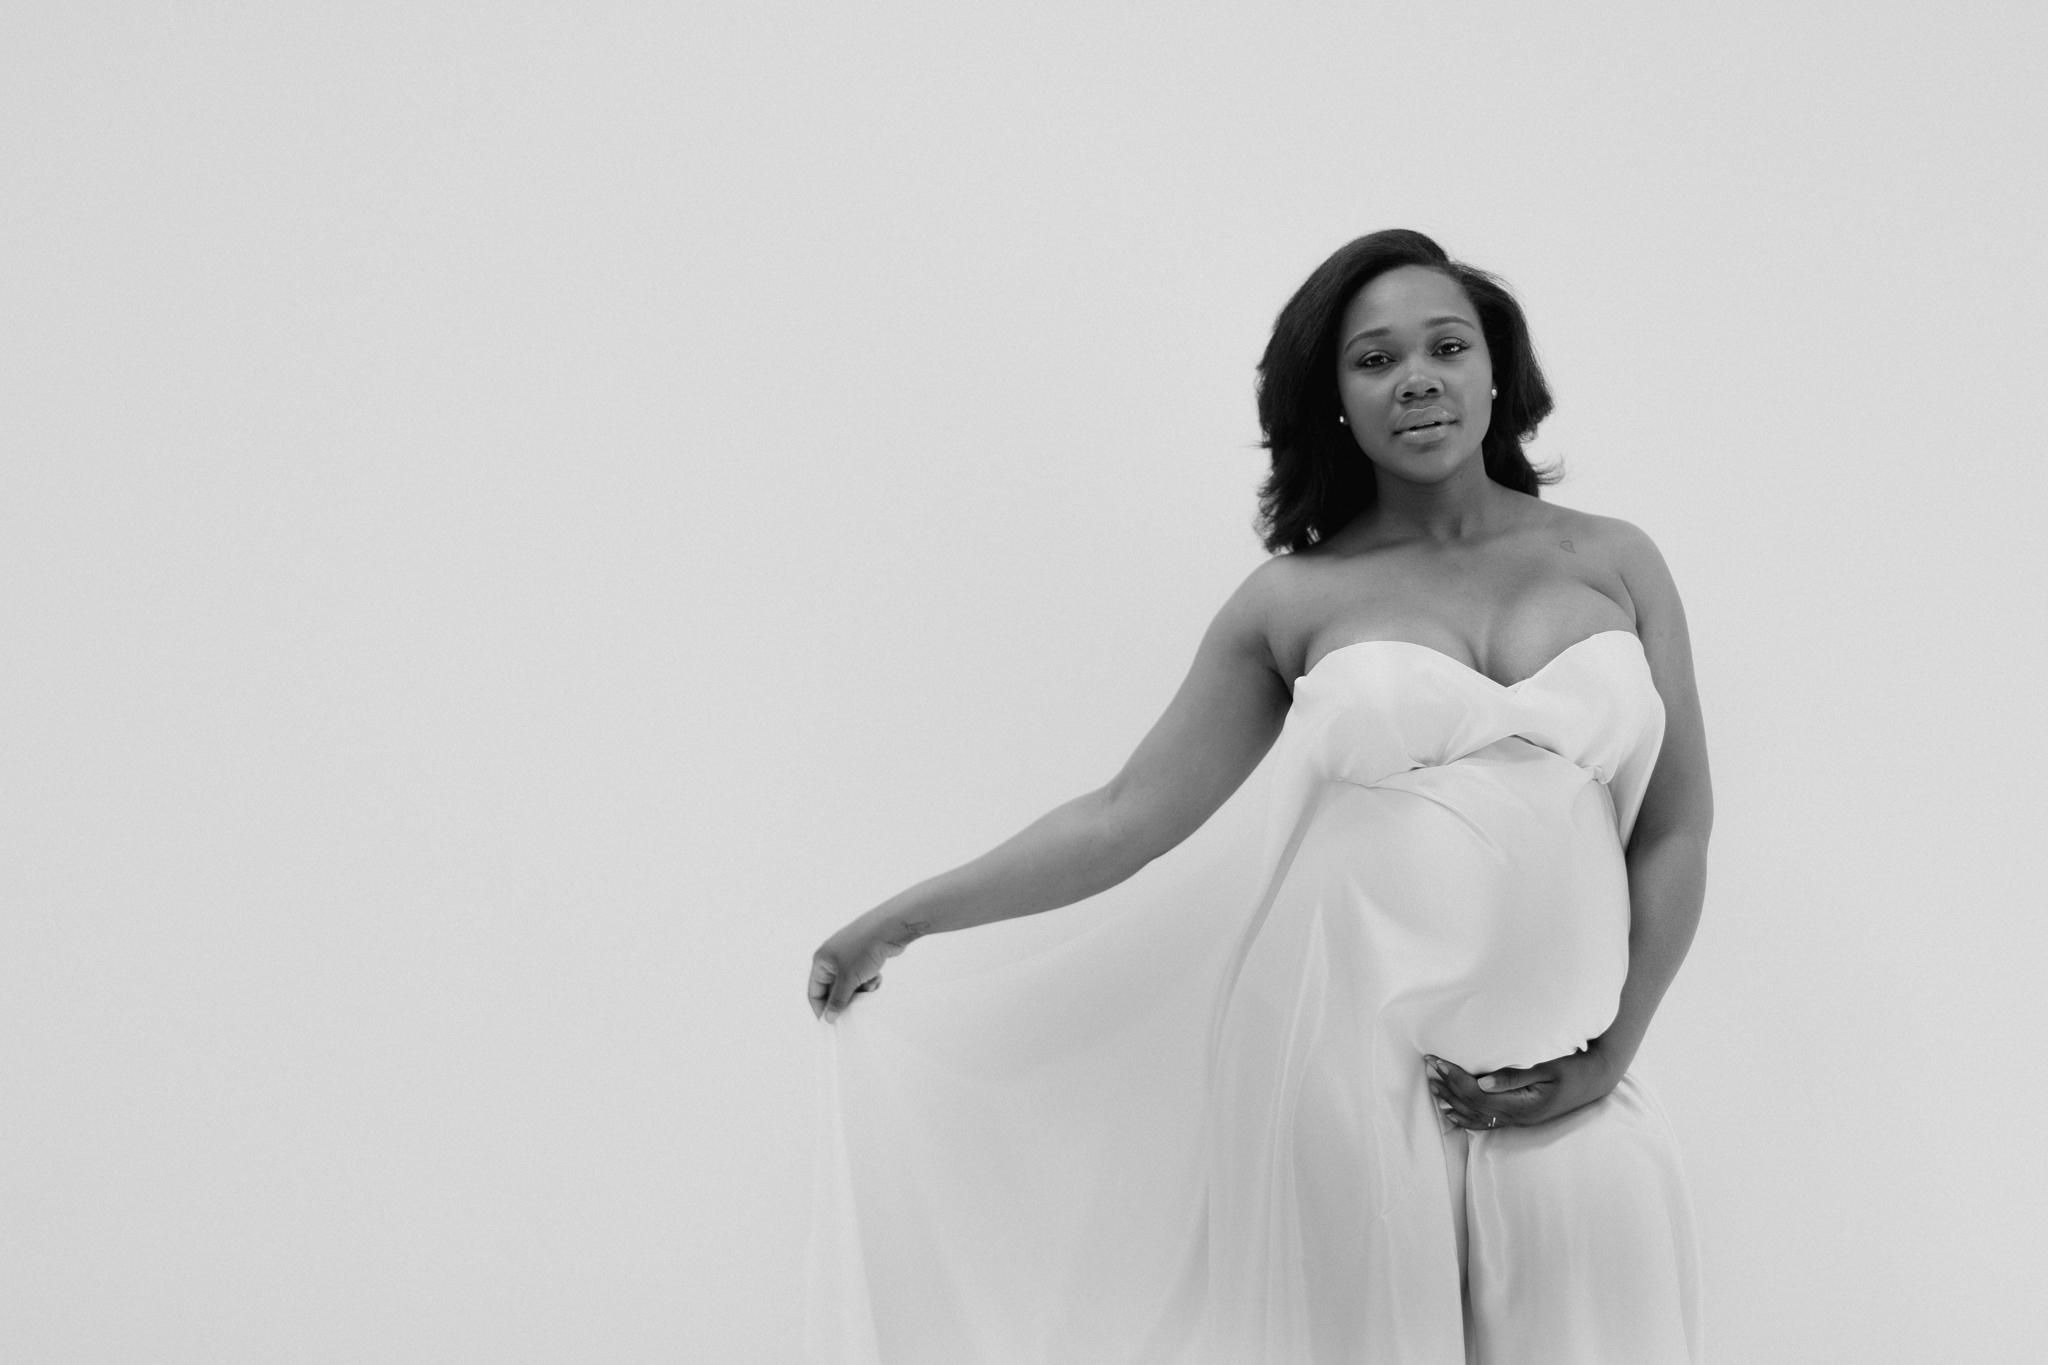 maternity-photographer-dallas-dfw-016.jpg